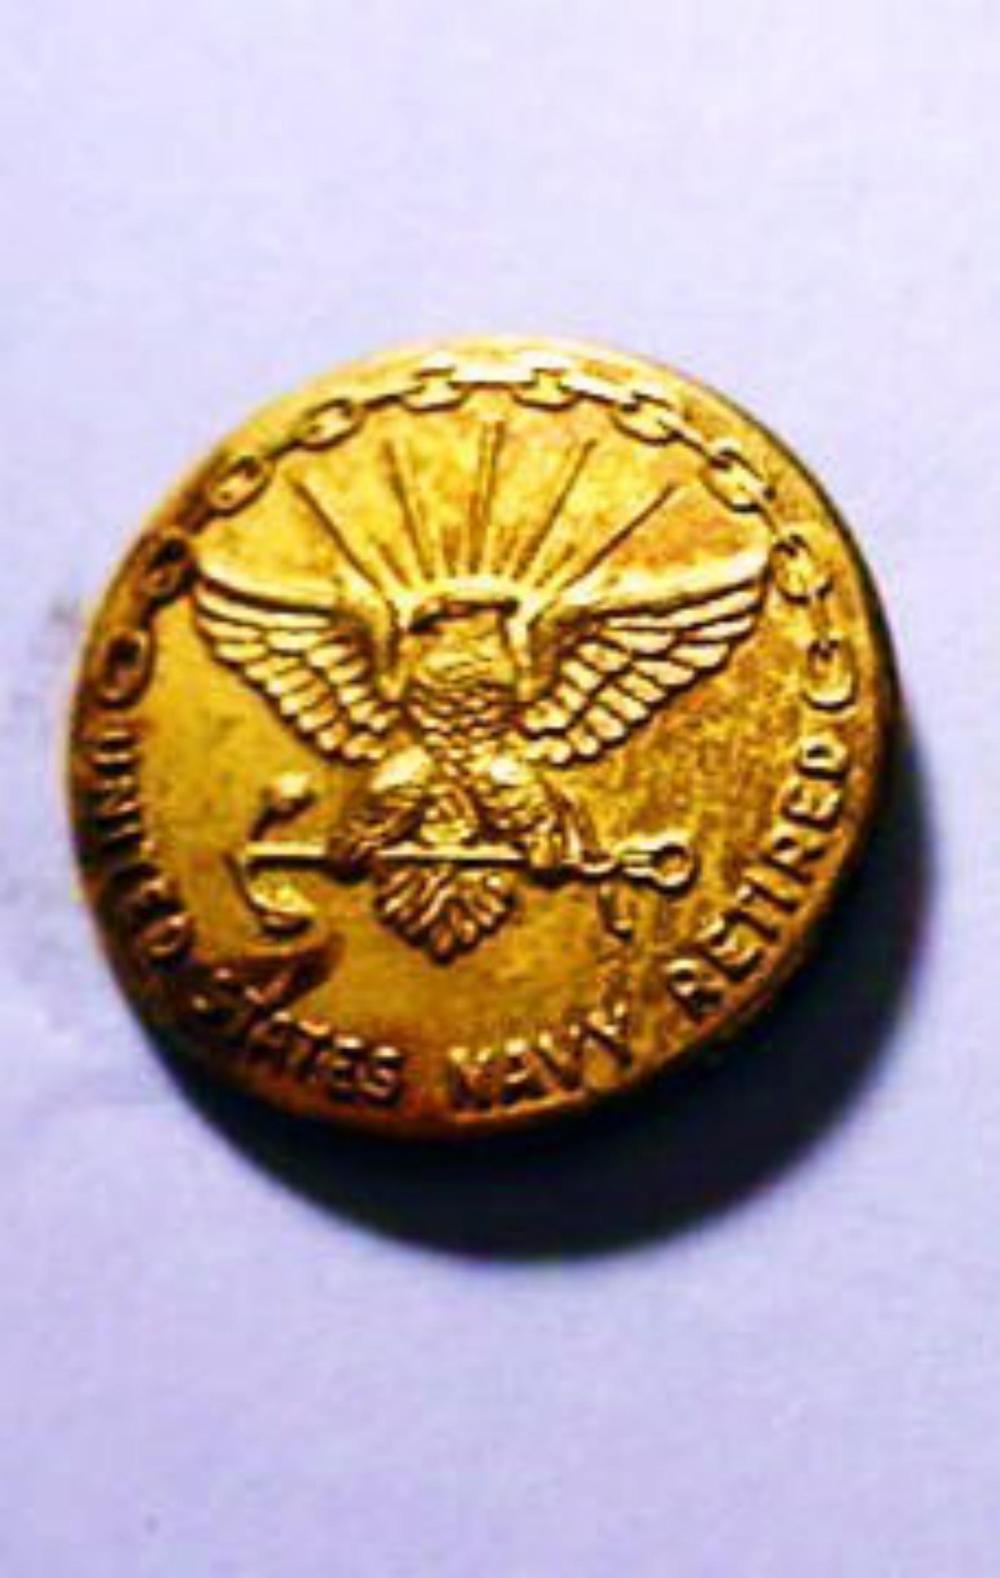 UNITED STATES NAVY RETIRED PIN